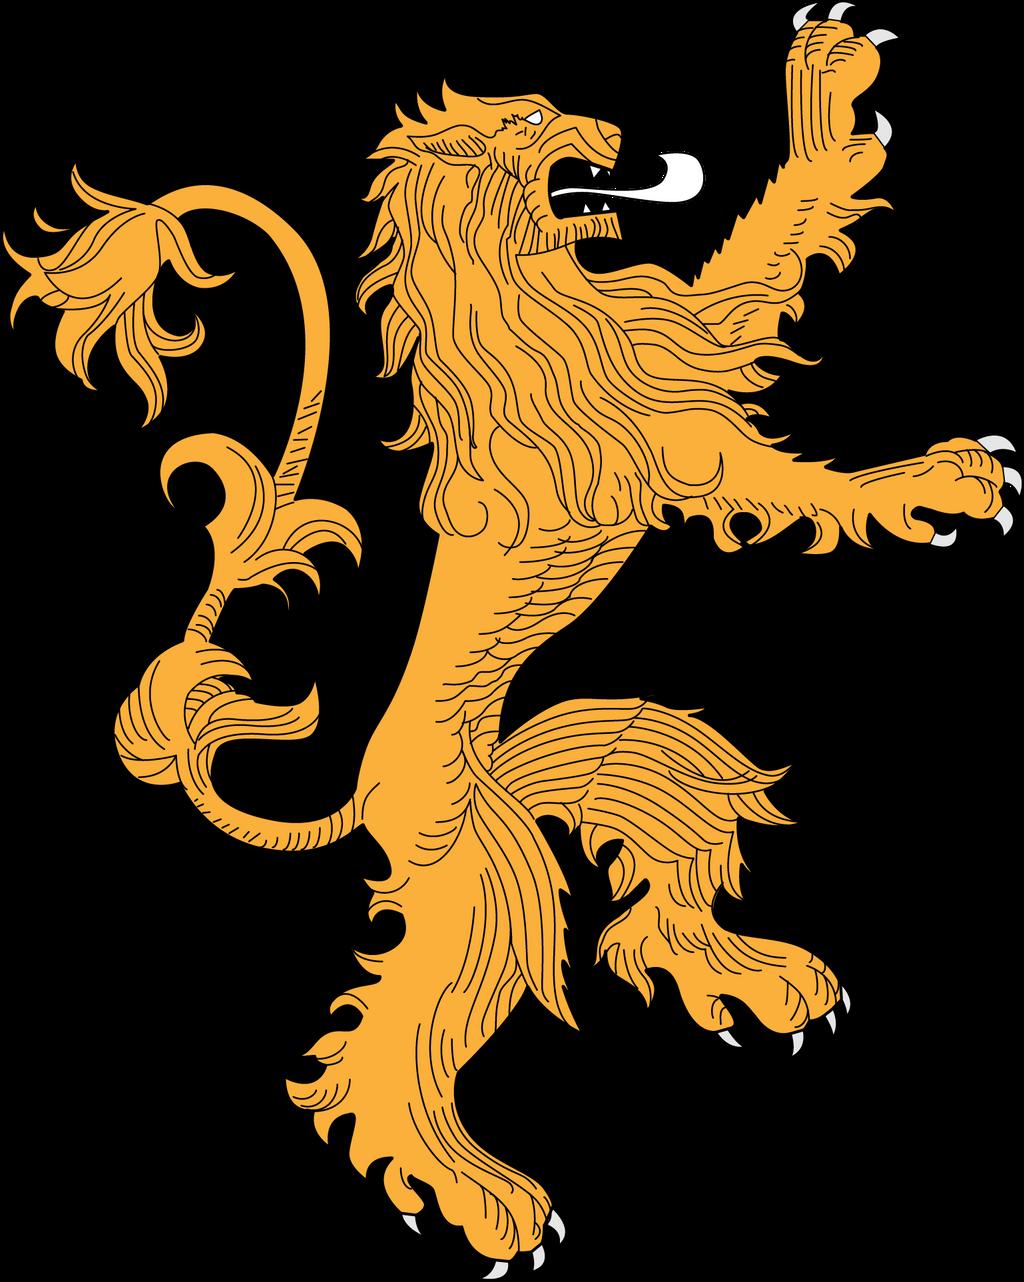 House Lannister Sigil House Lannister Sigil